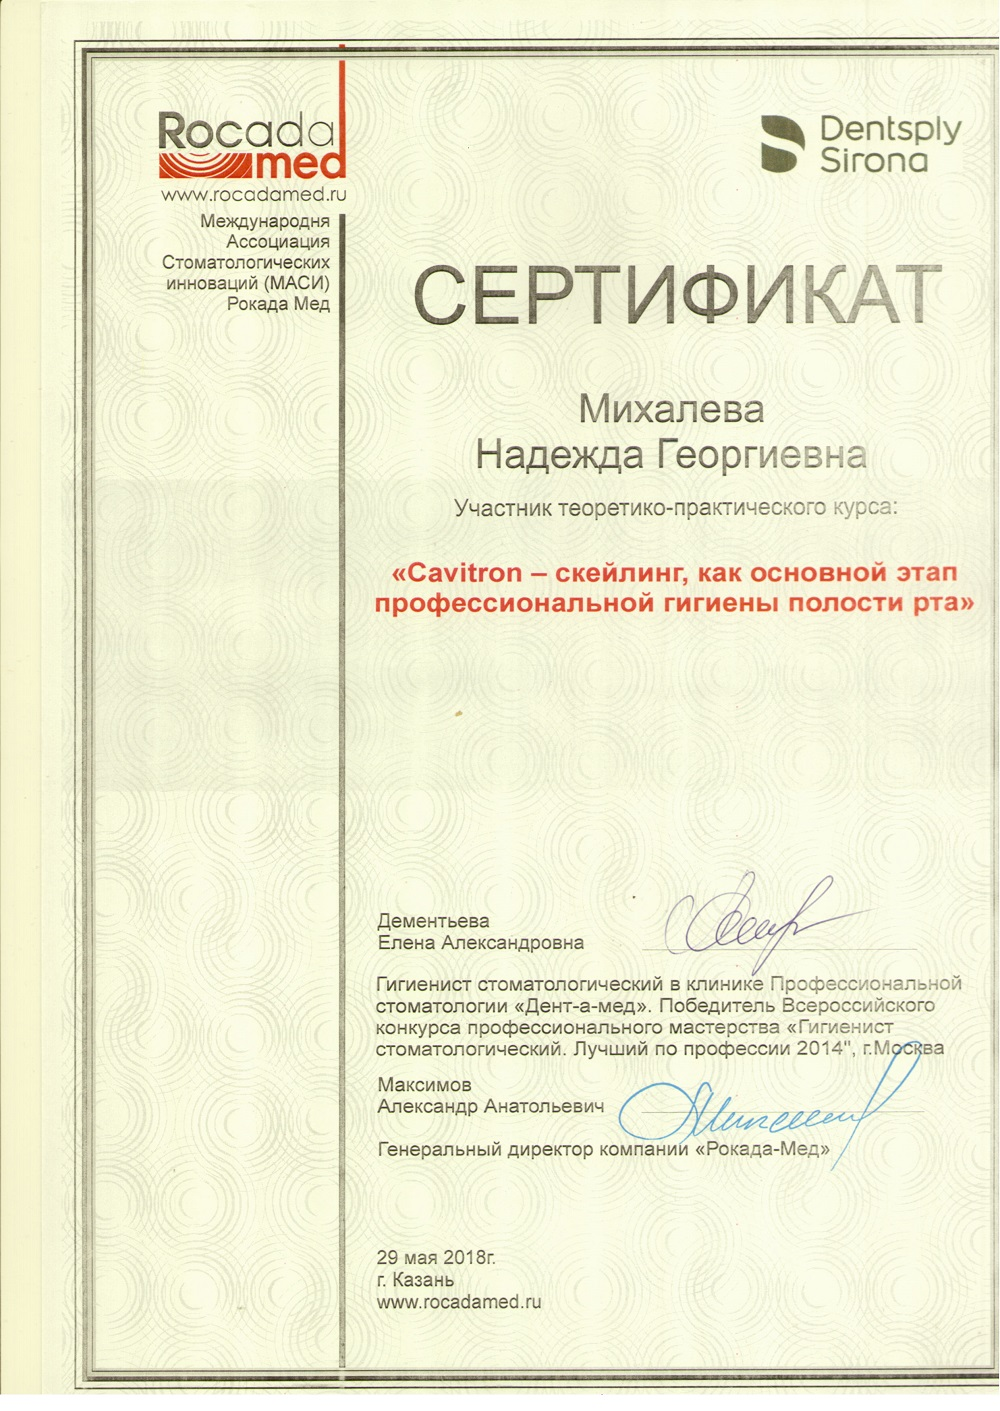 Сертификат участника теоретико-практического курса Cavitron